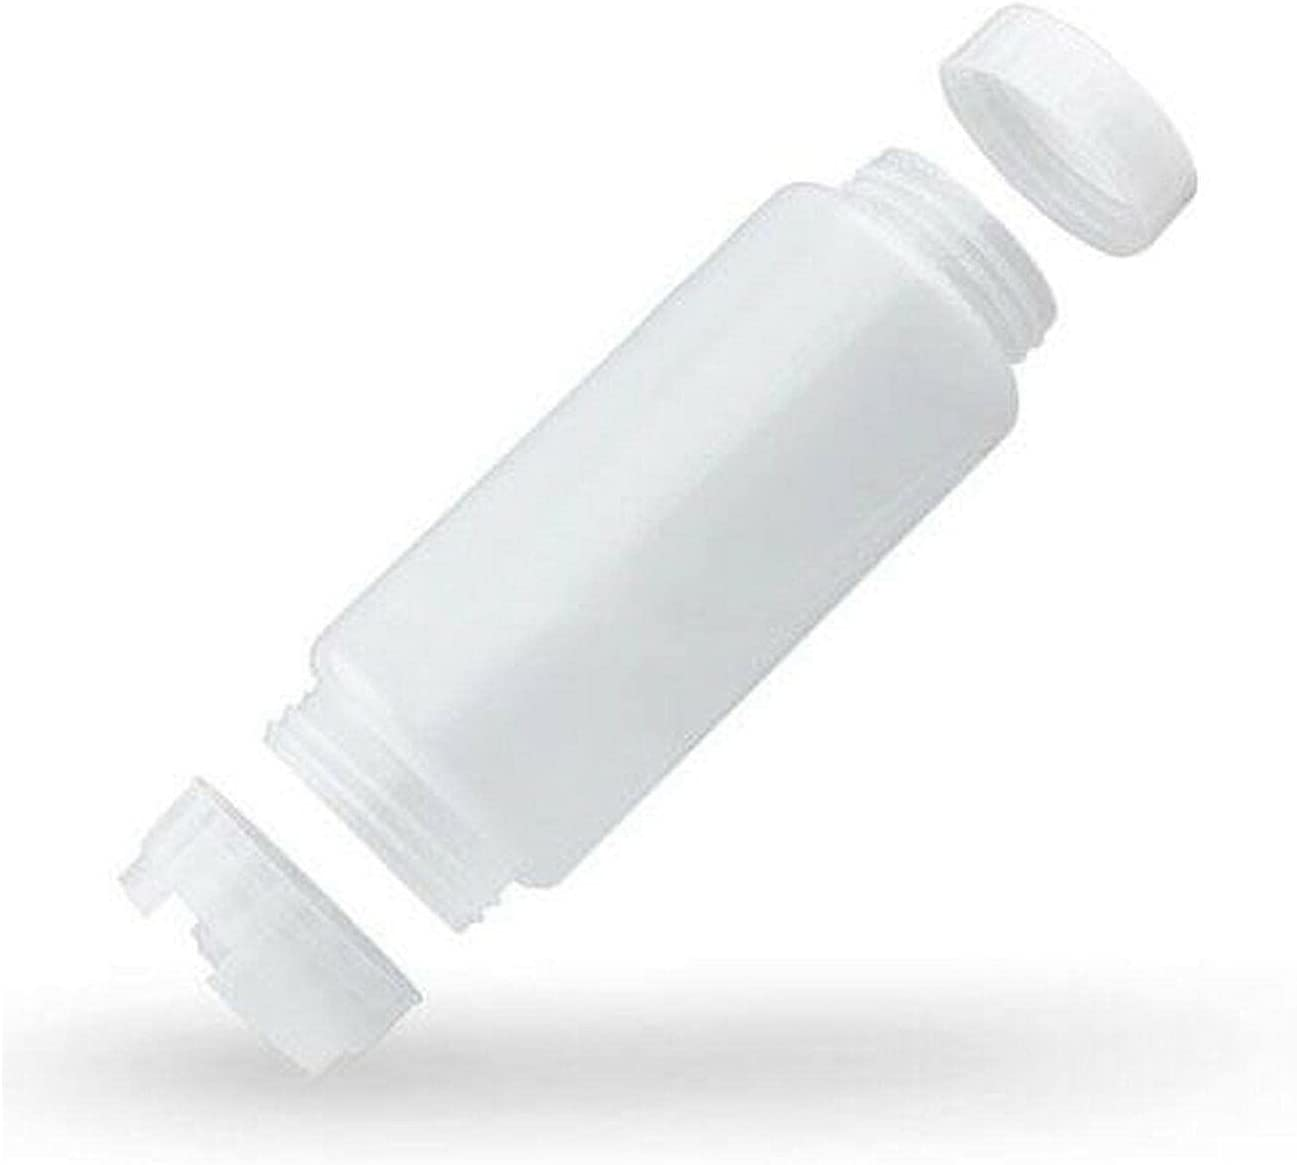 1 Pack San Antonio Mall 16 oz. Squeeze Condiment Don't miss the campaign Dispenser Bottle bottl dispenser